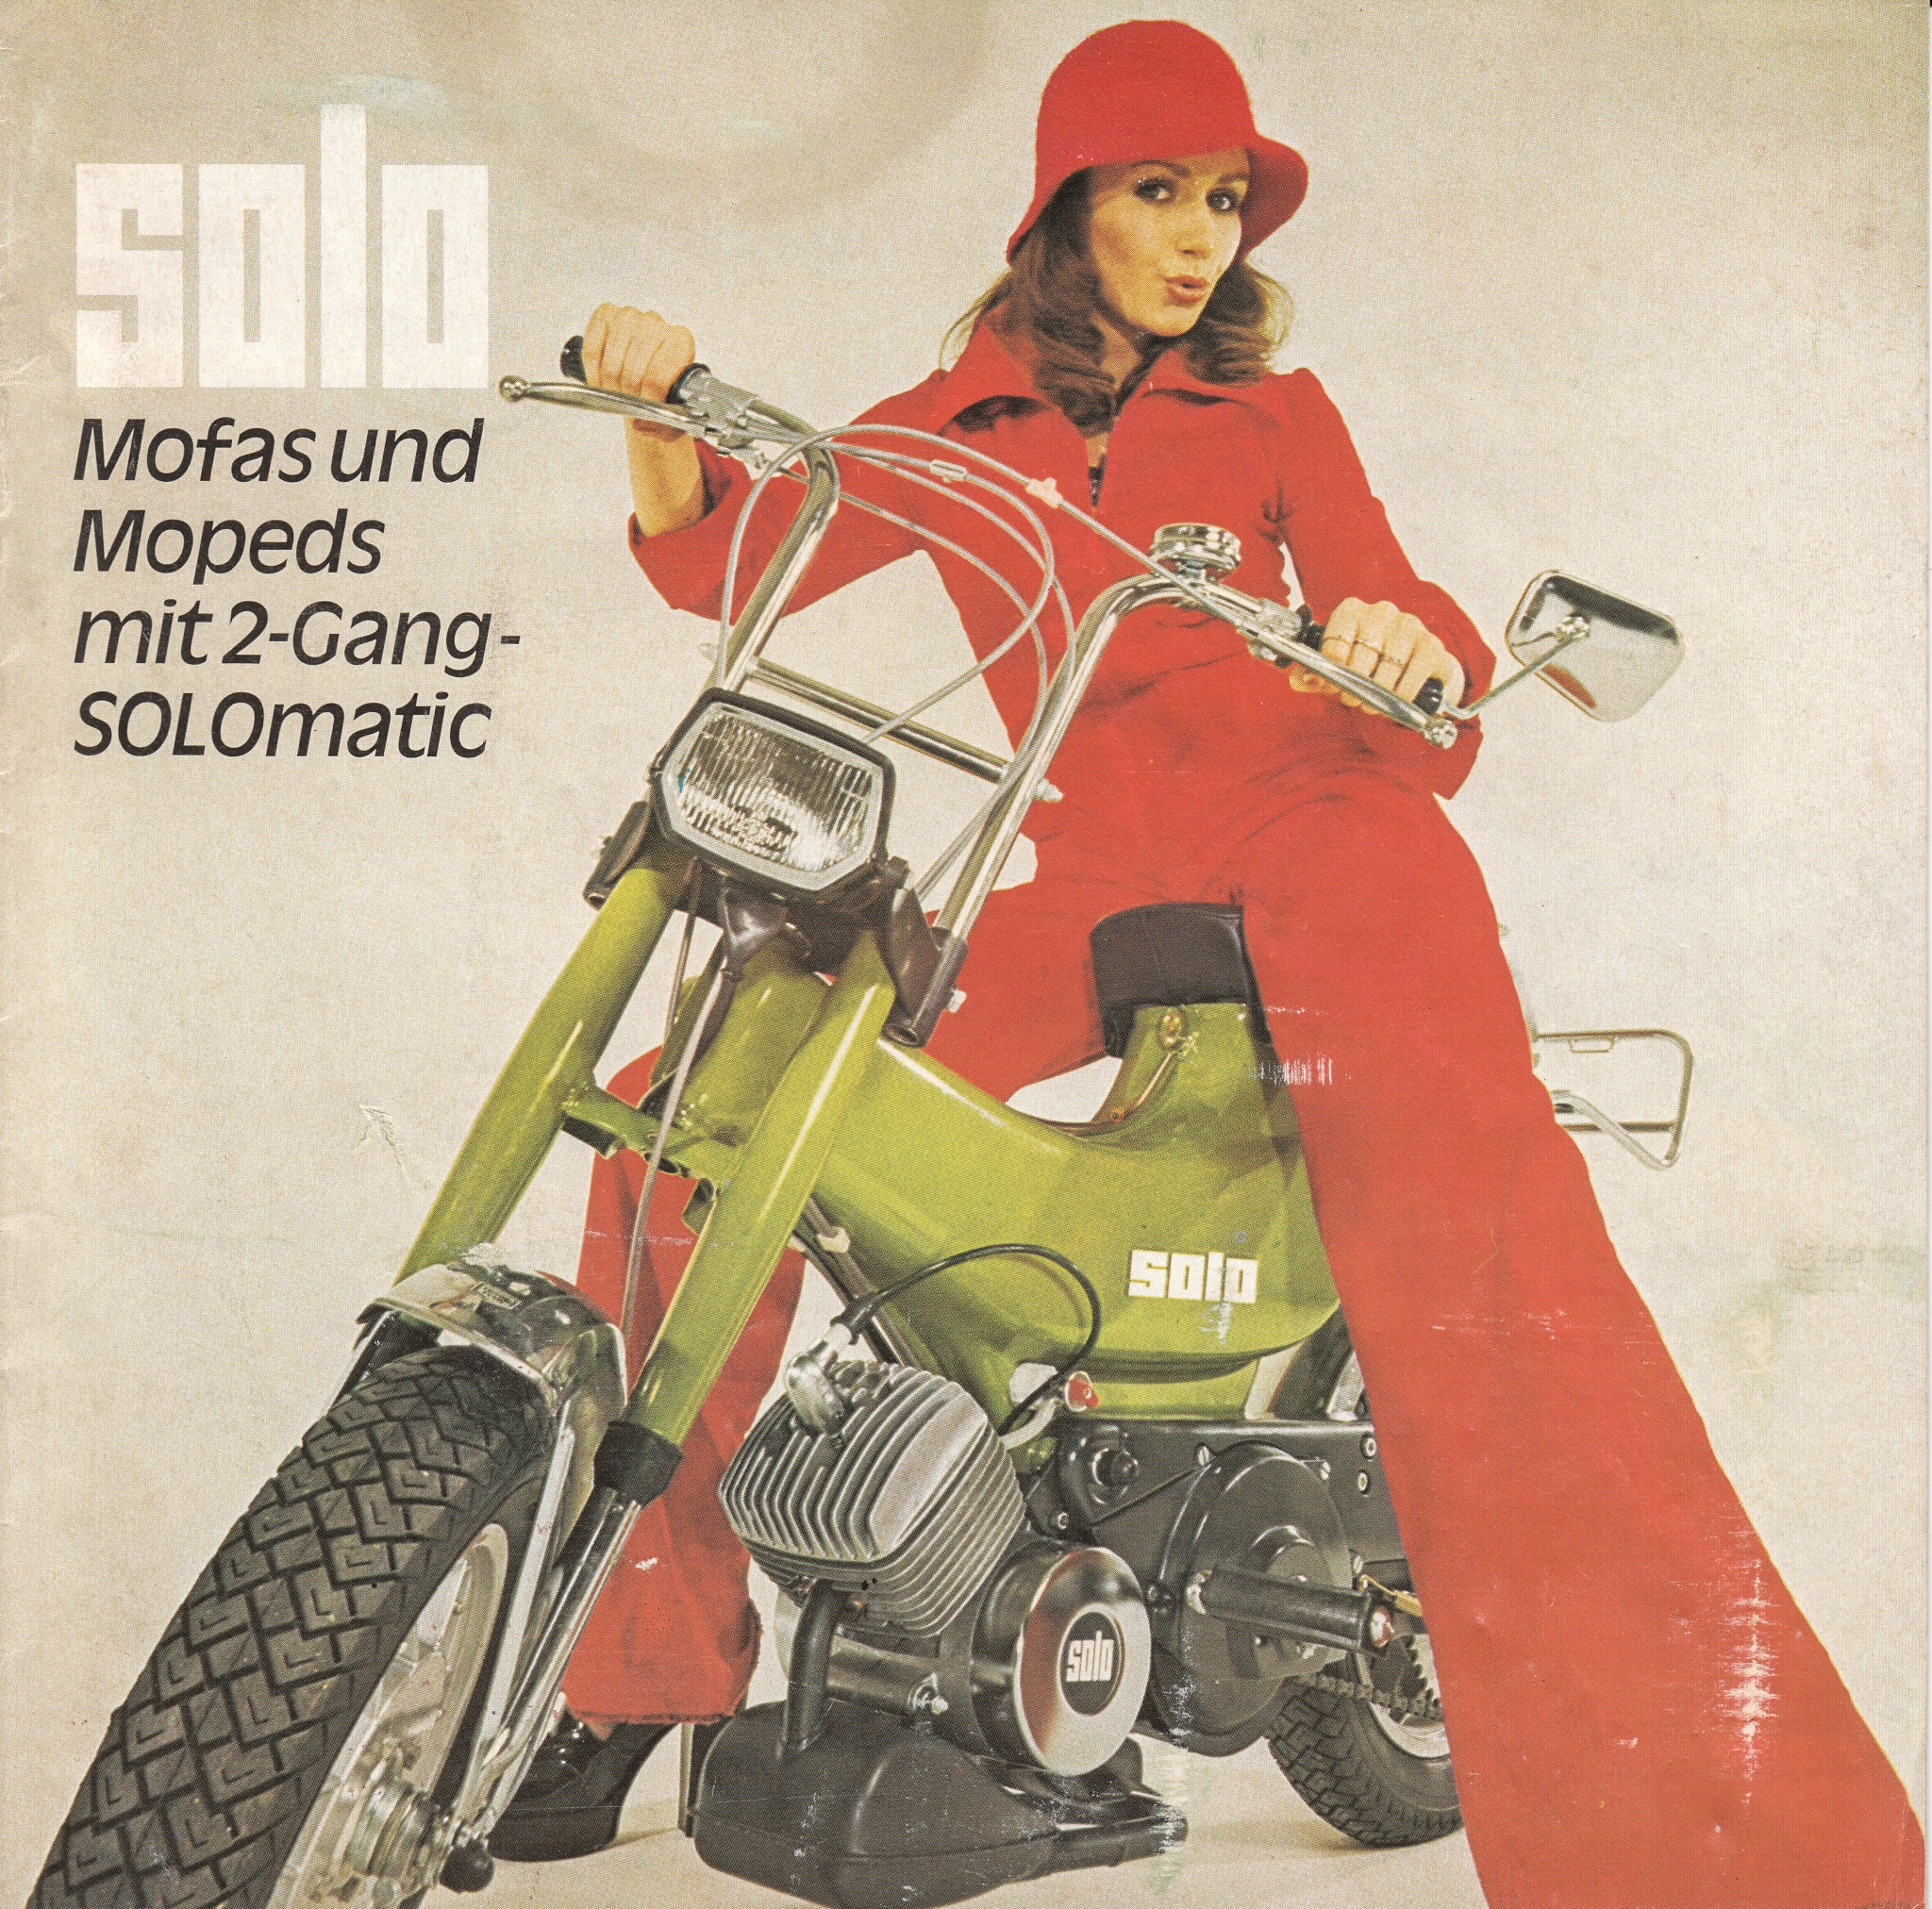 Solo Mofa 725 und Moped 726